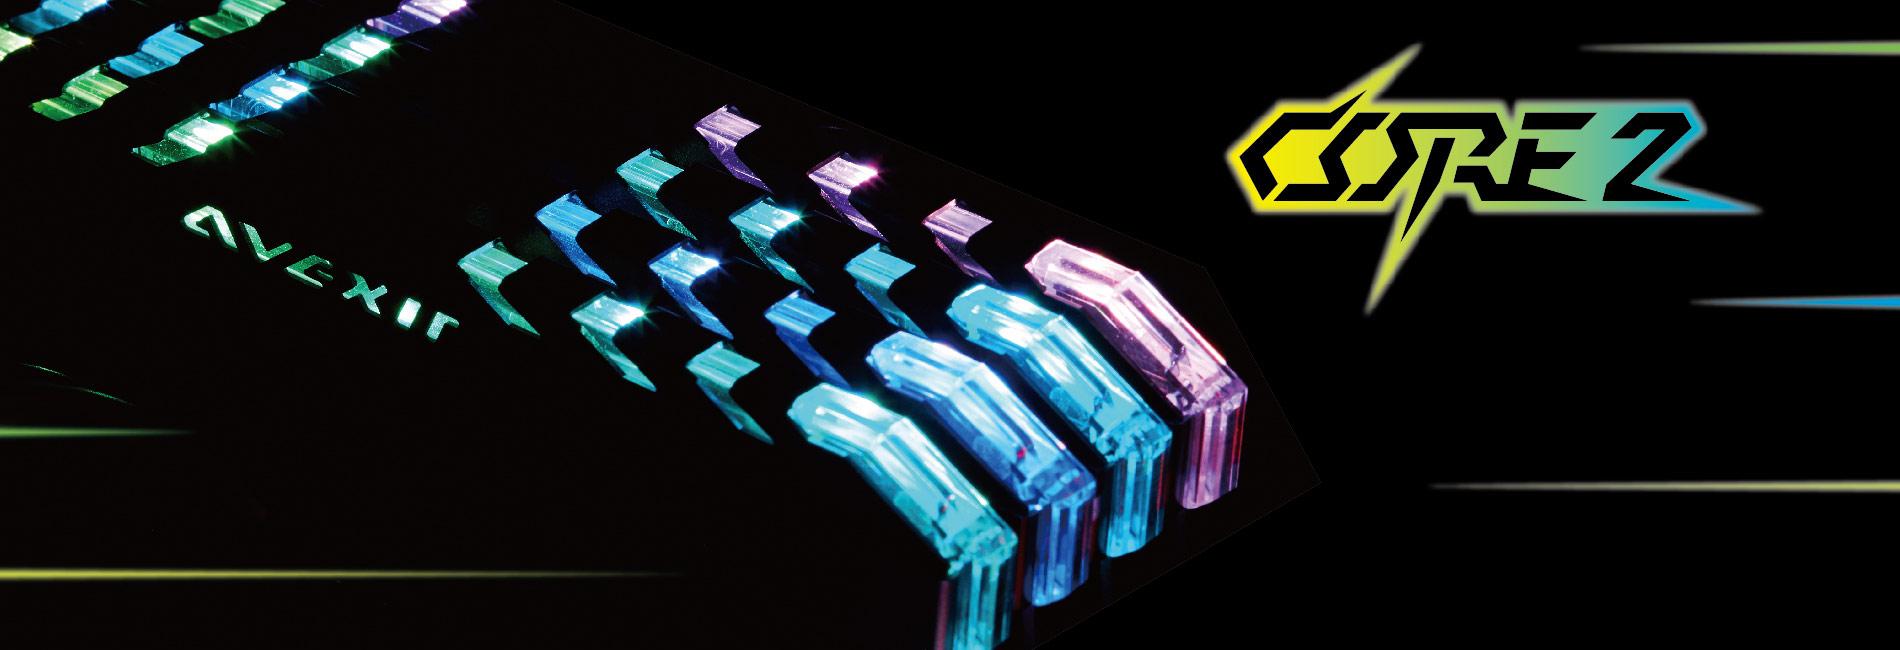 Ram Desktop AVERXIR 2C2C - Core2 RGB